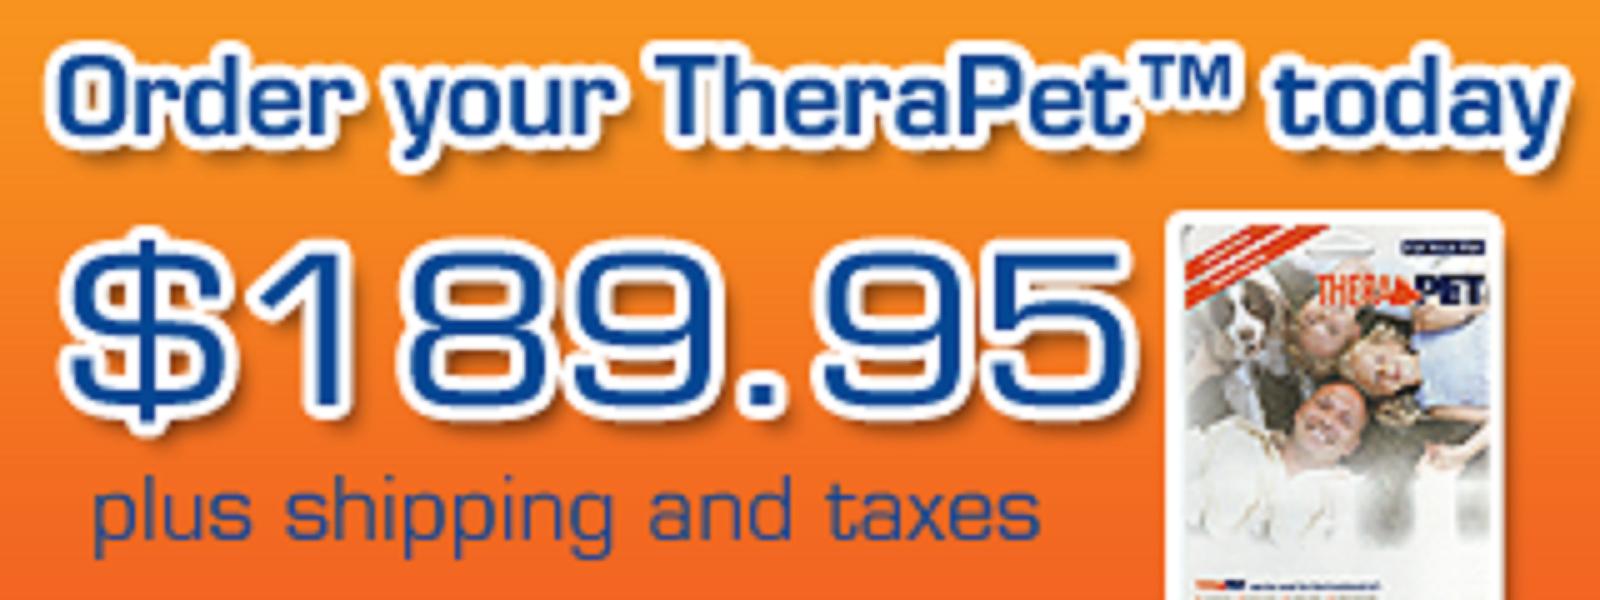 Photon Therapeutic Inc